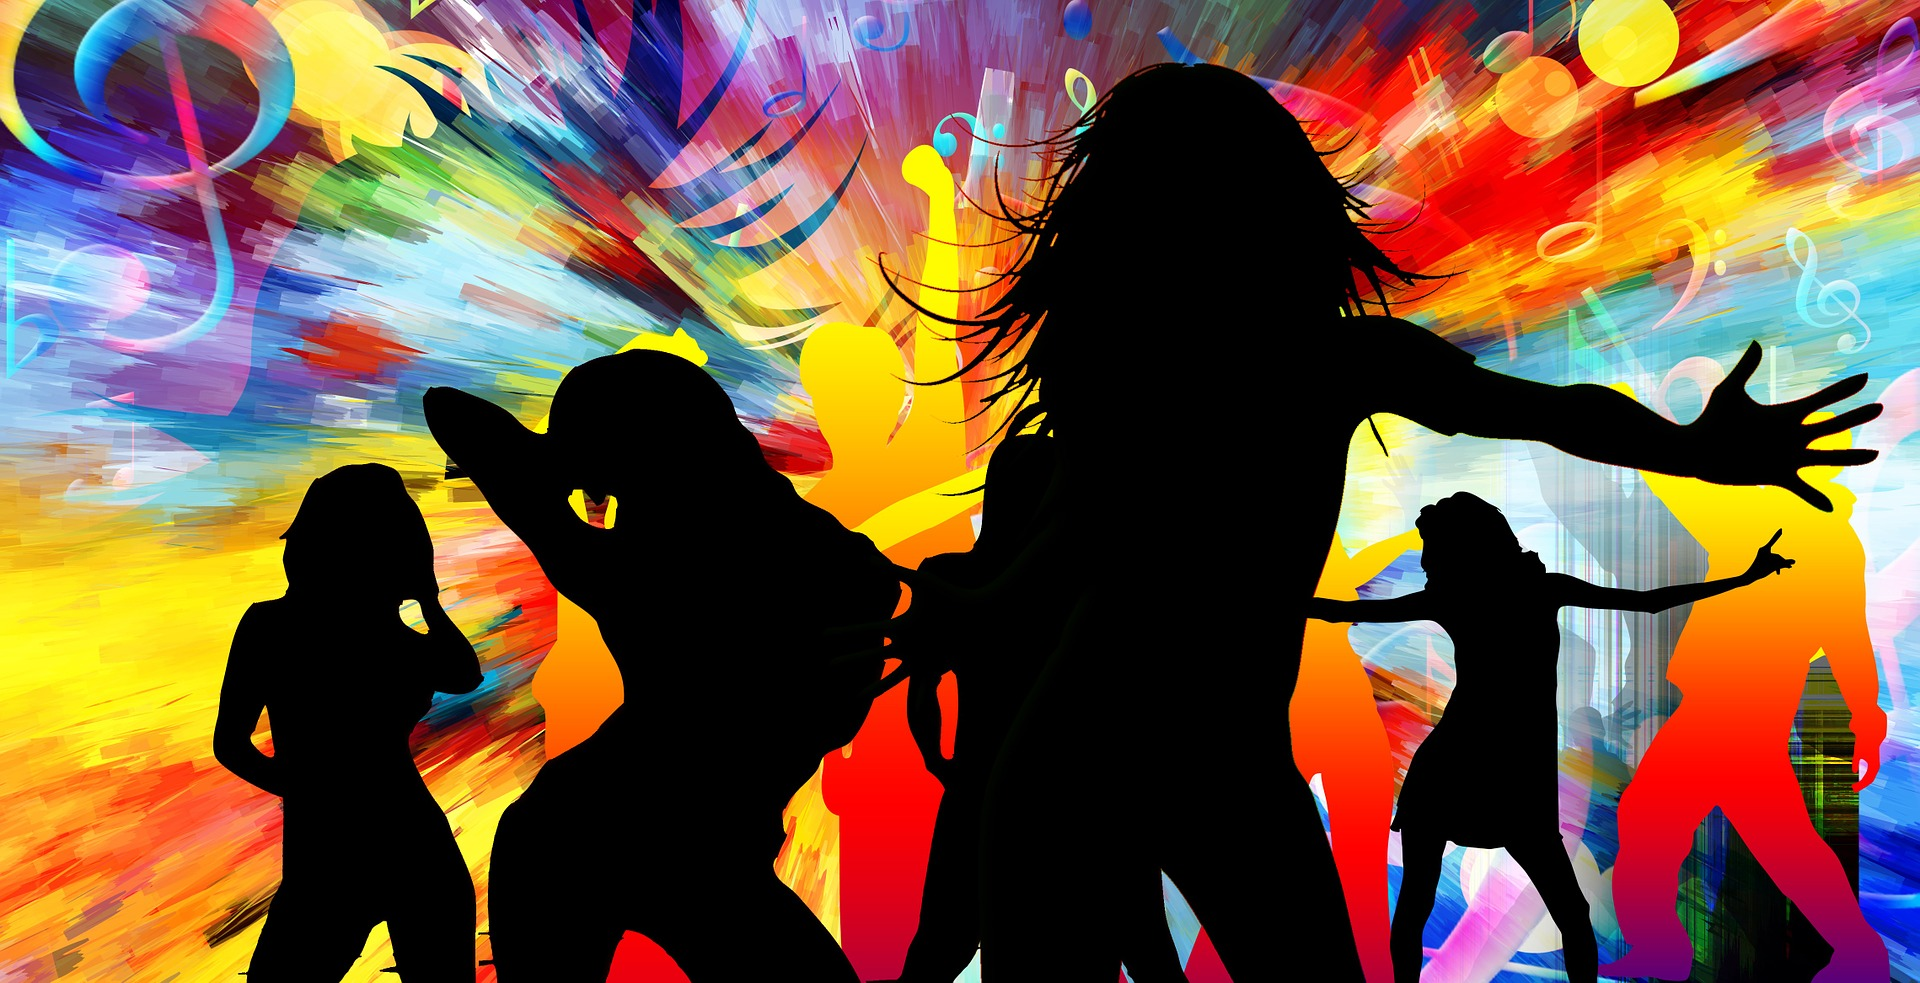 baile, Tanz, Disk, Partei, Rhythmus, Frau, Pop, Farben - Wallpaper HD - Prof.-falken.com